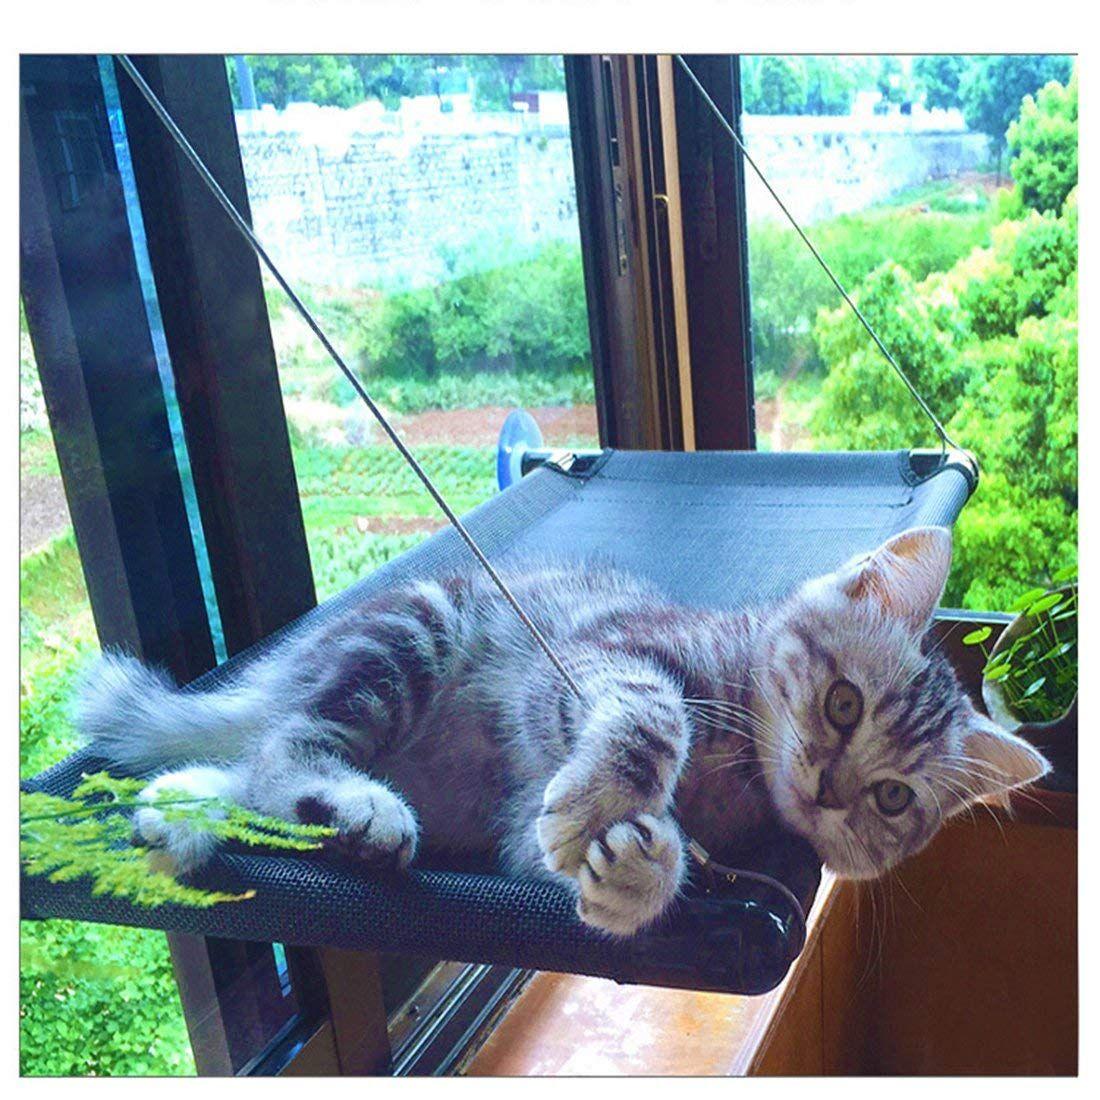 Cat Bed Window Hammock Perch Kitty Sunny Seat Cradle Mat Pet Perch Bedding Window Mounted Lounge Pet Nest Sofa Supplies He Cat Bed Cat Hammock Cat Window Perch